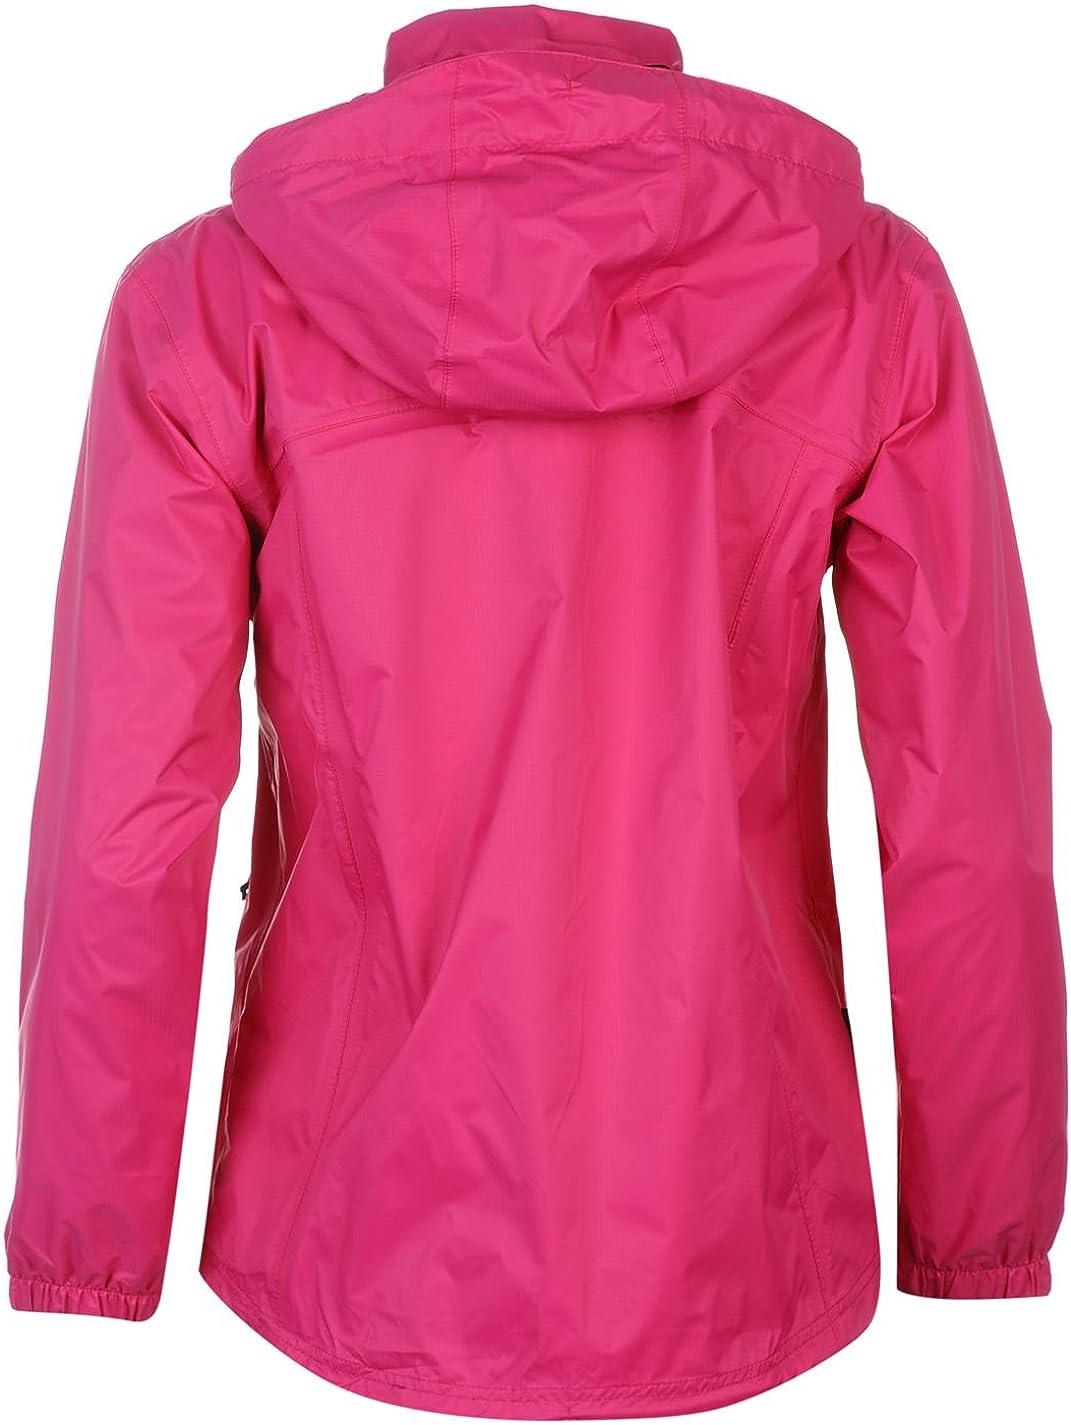 Karrimor Womens Sierra Jacket Ladies Coral Pink 22 XXXXL